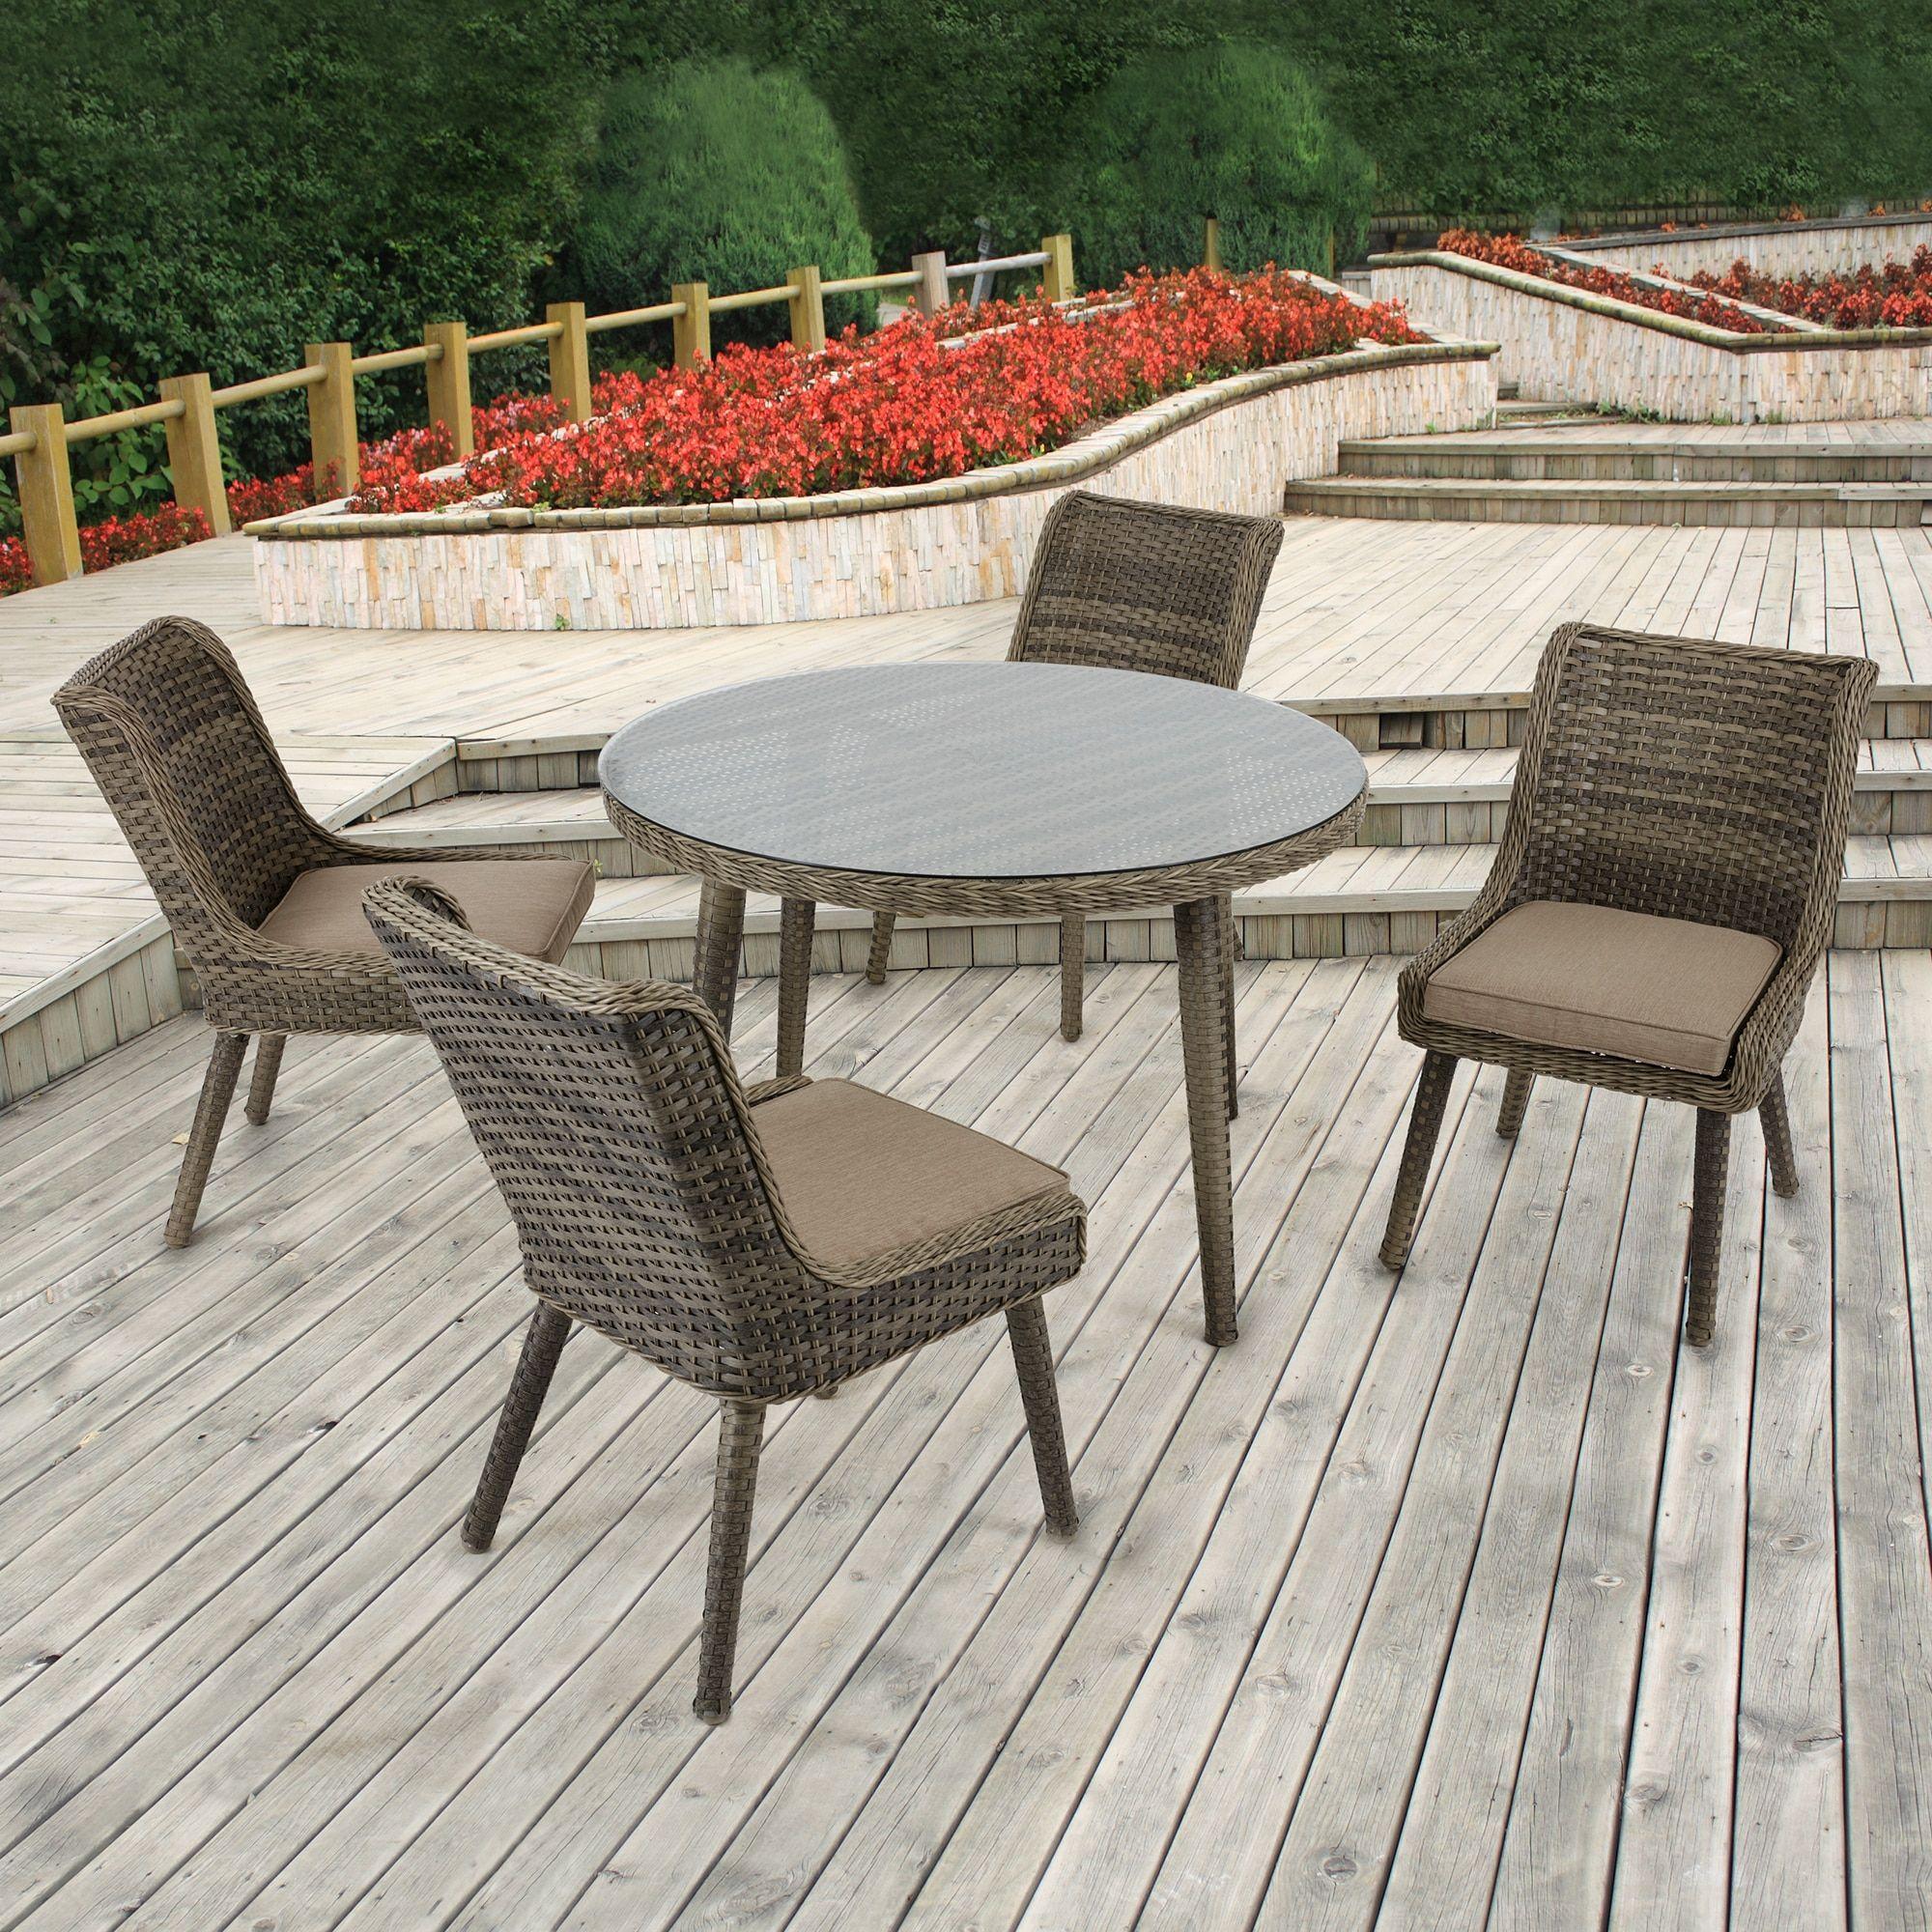 Madison Park Dana Grey Outdoor Round Table Dia 45 875 X 29 375 H Patio Furniture Aluminum